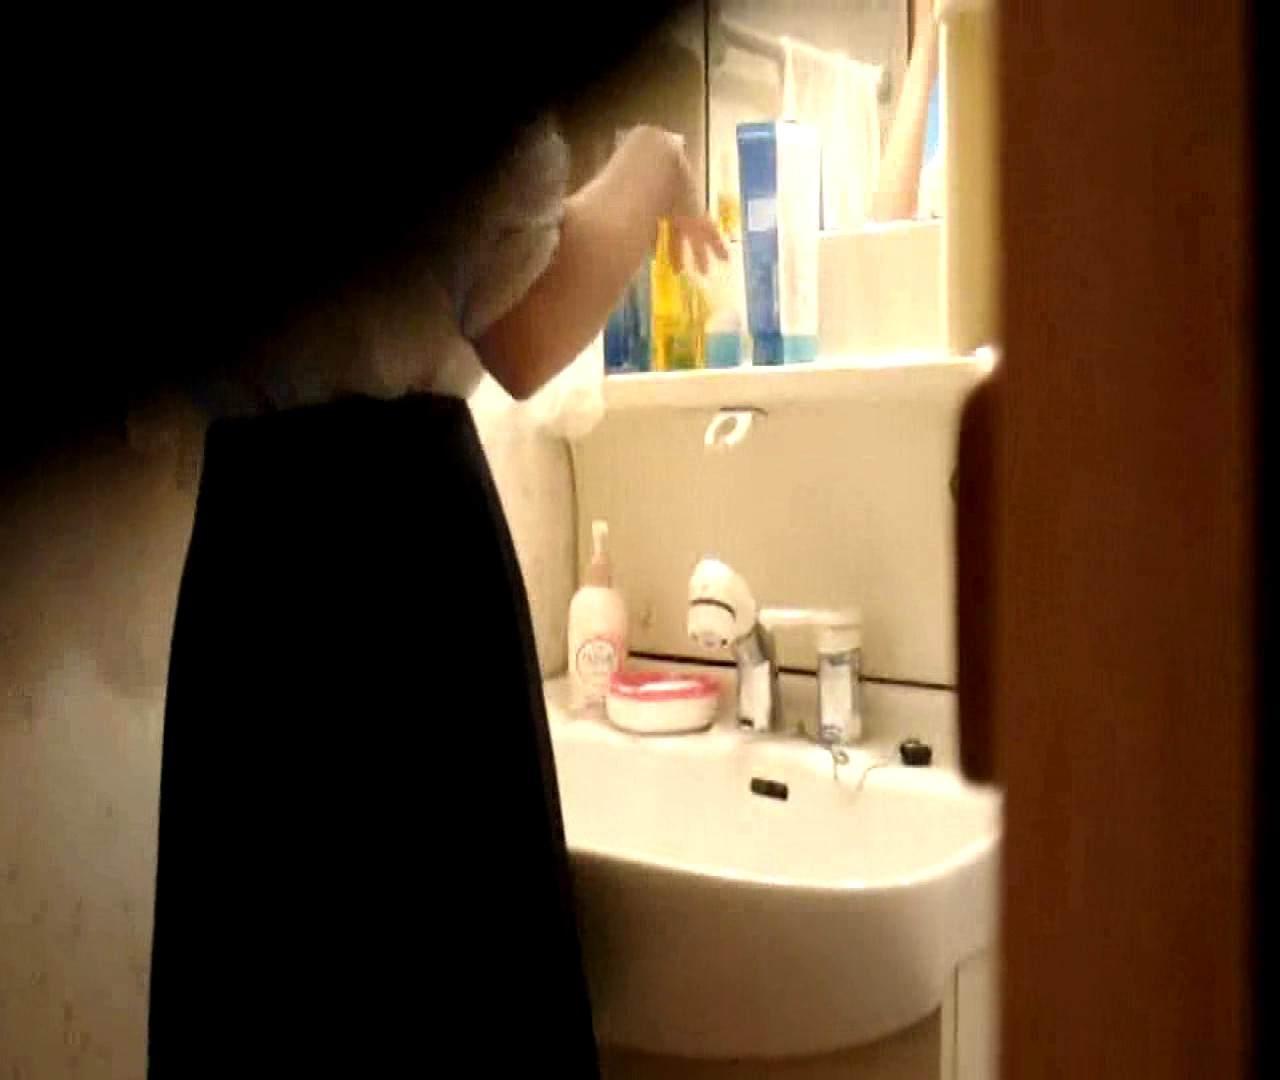 vol.5 まどかが帰宅後の洗顔後にブラを洗ってます。 ギャル達 | 民家  112枚 61